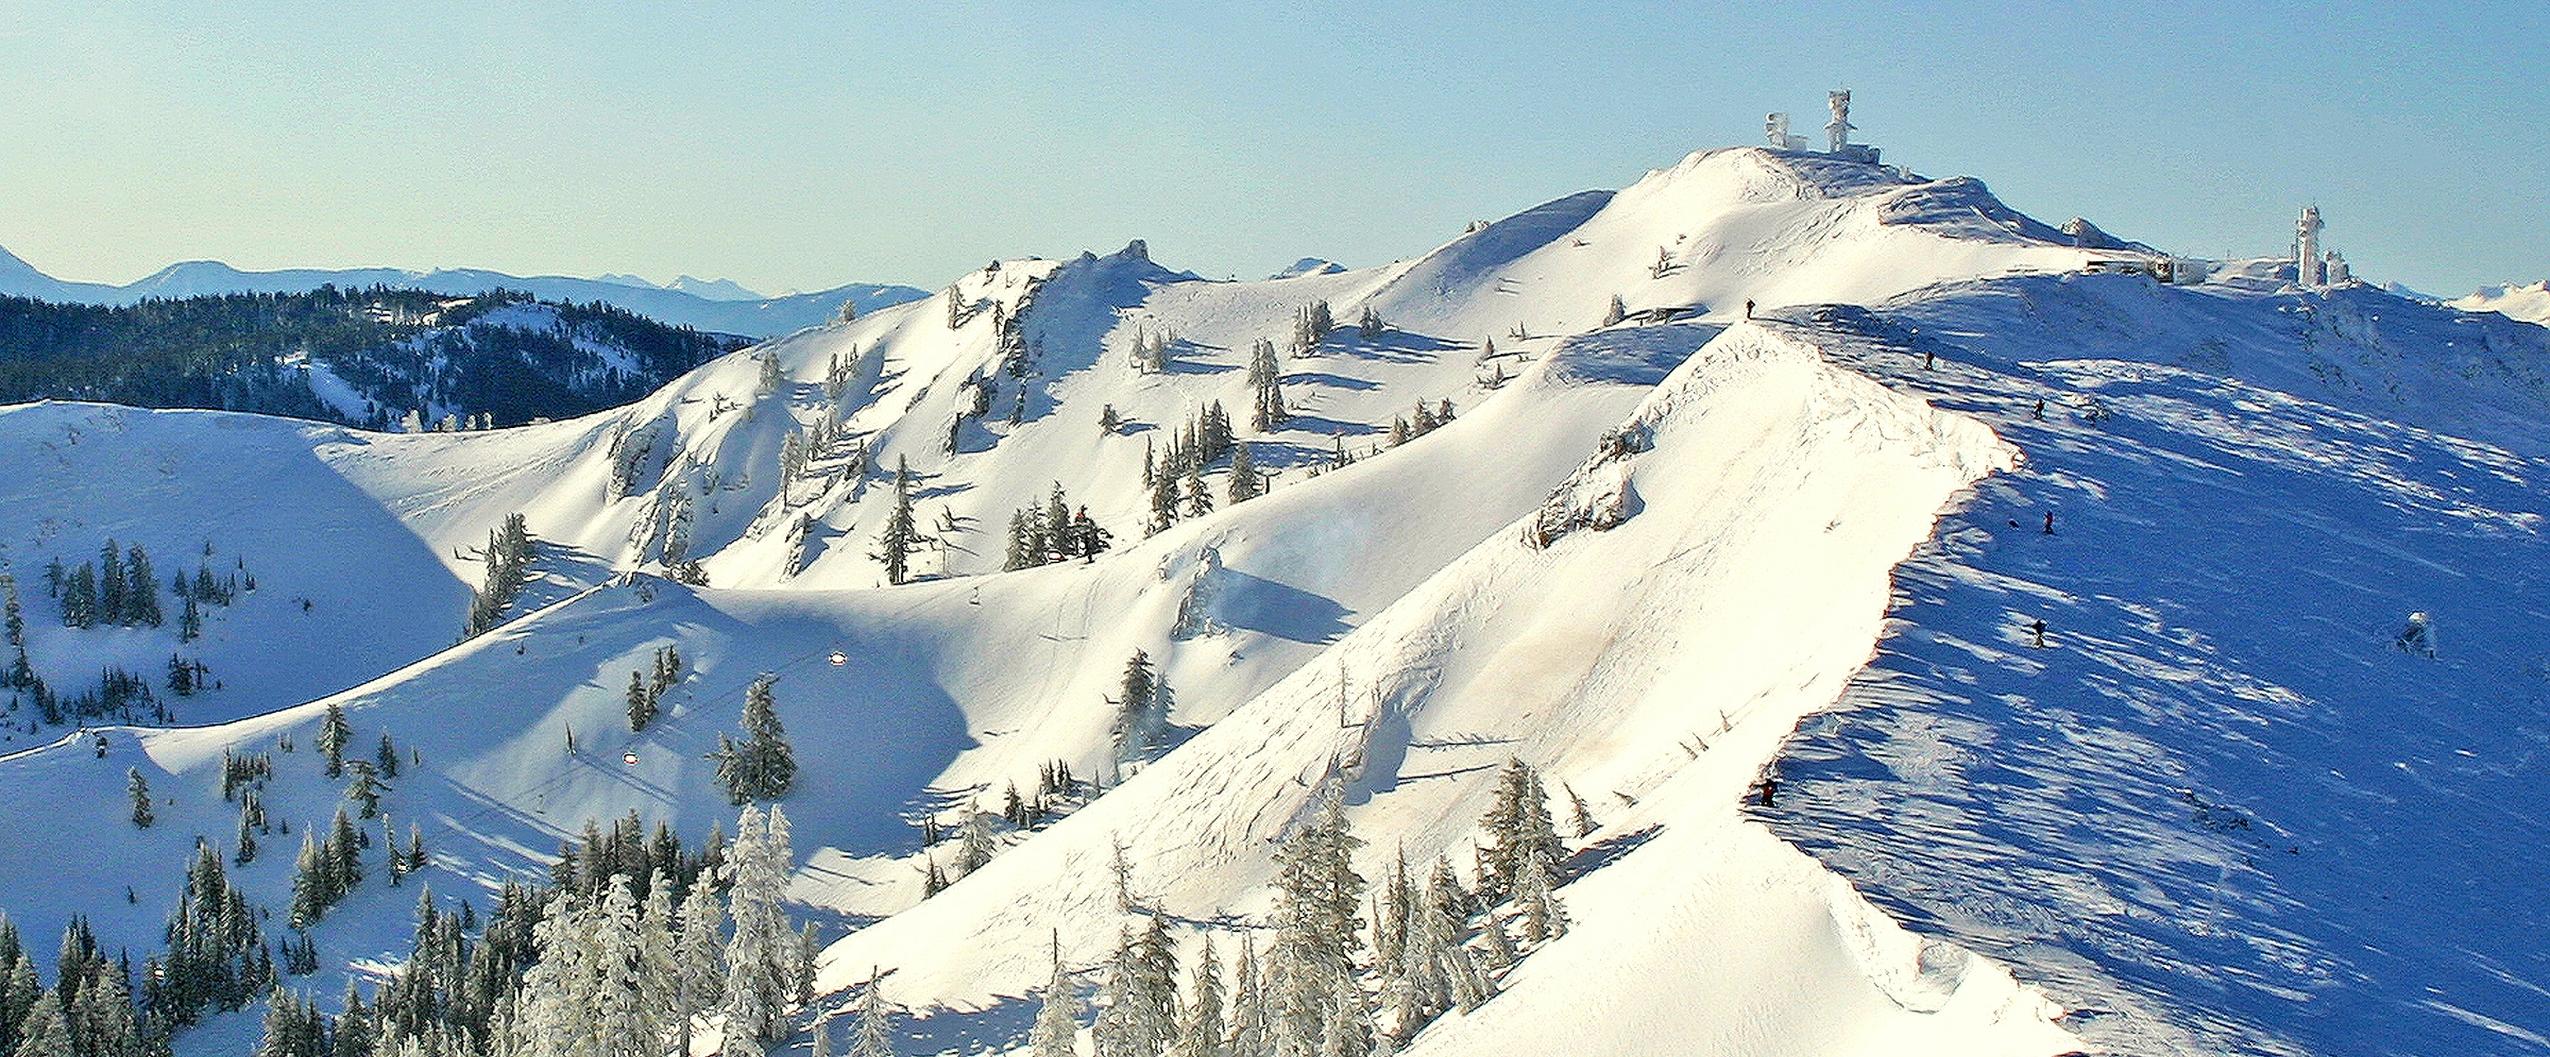 tahoe ski resort real estate | lake tahoe ski resort homes